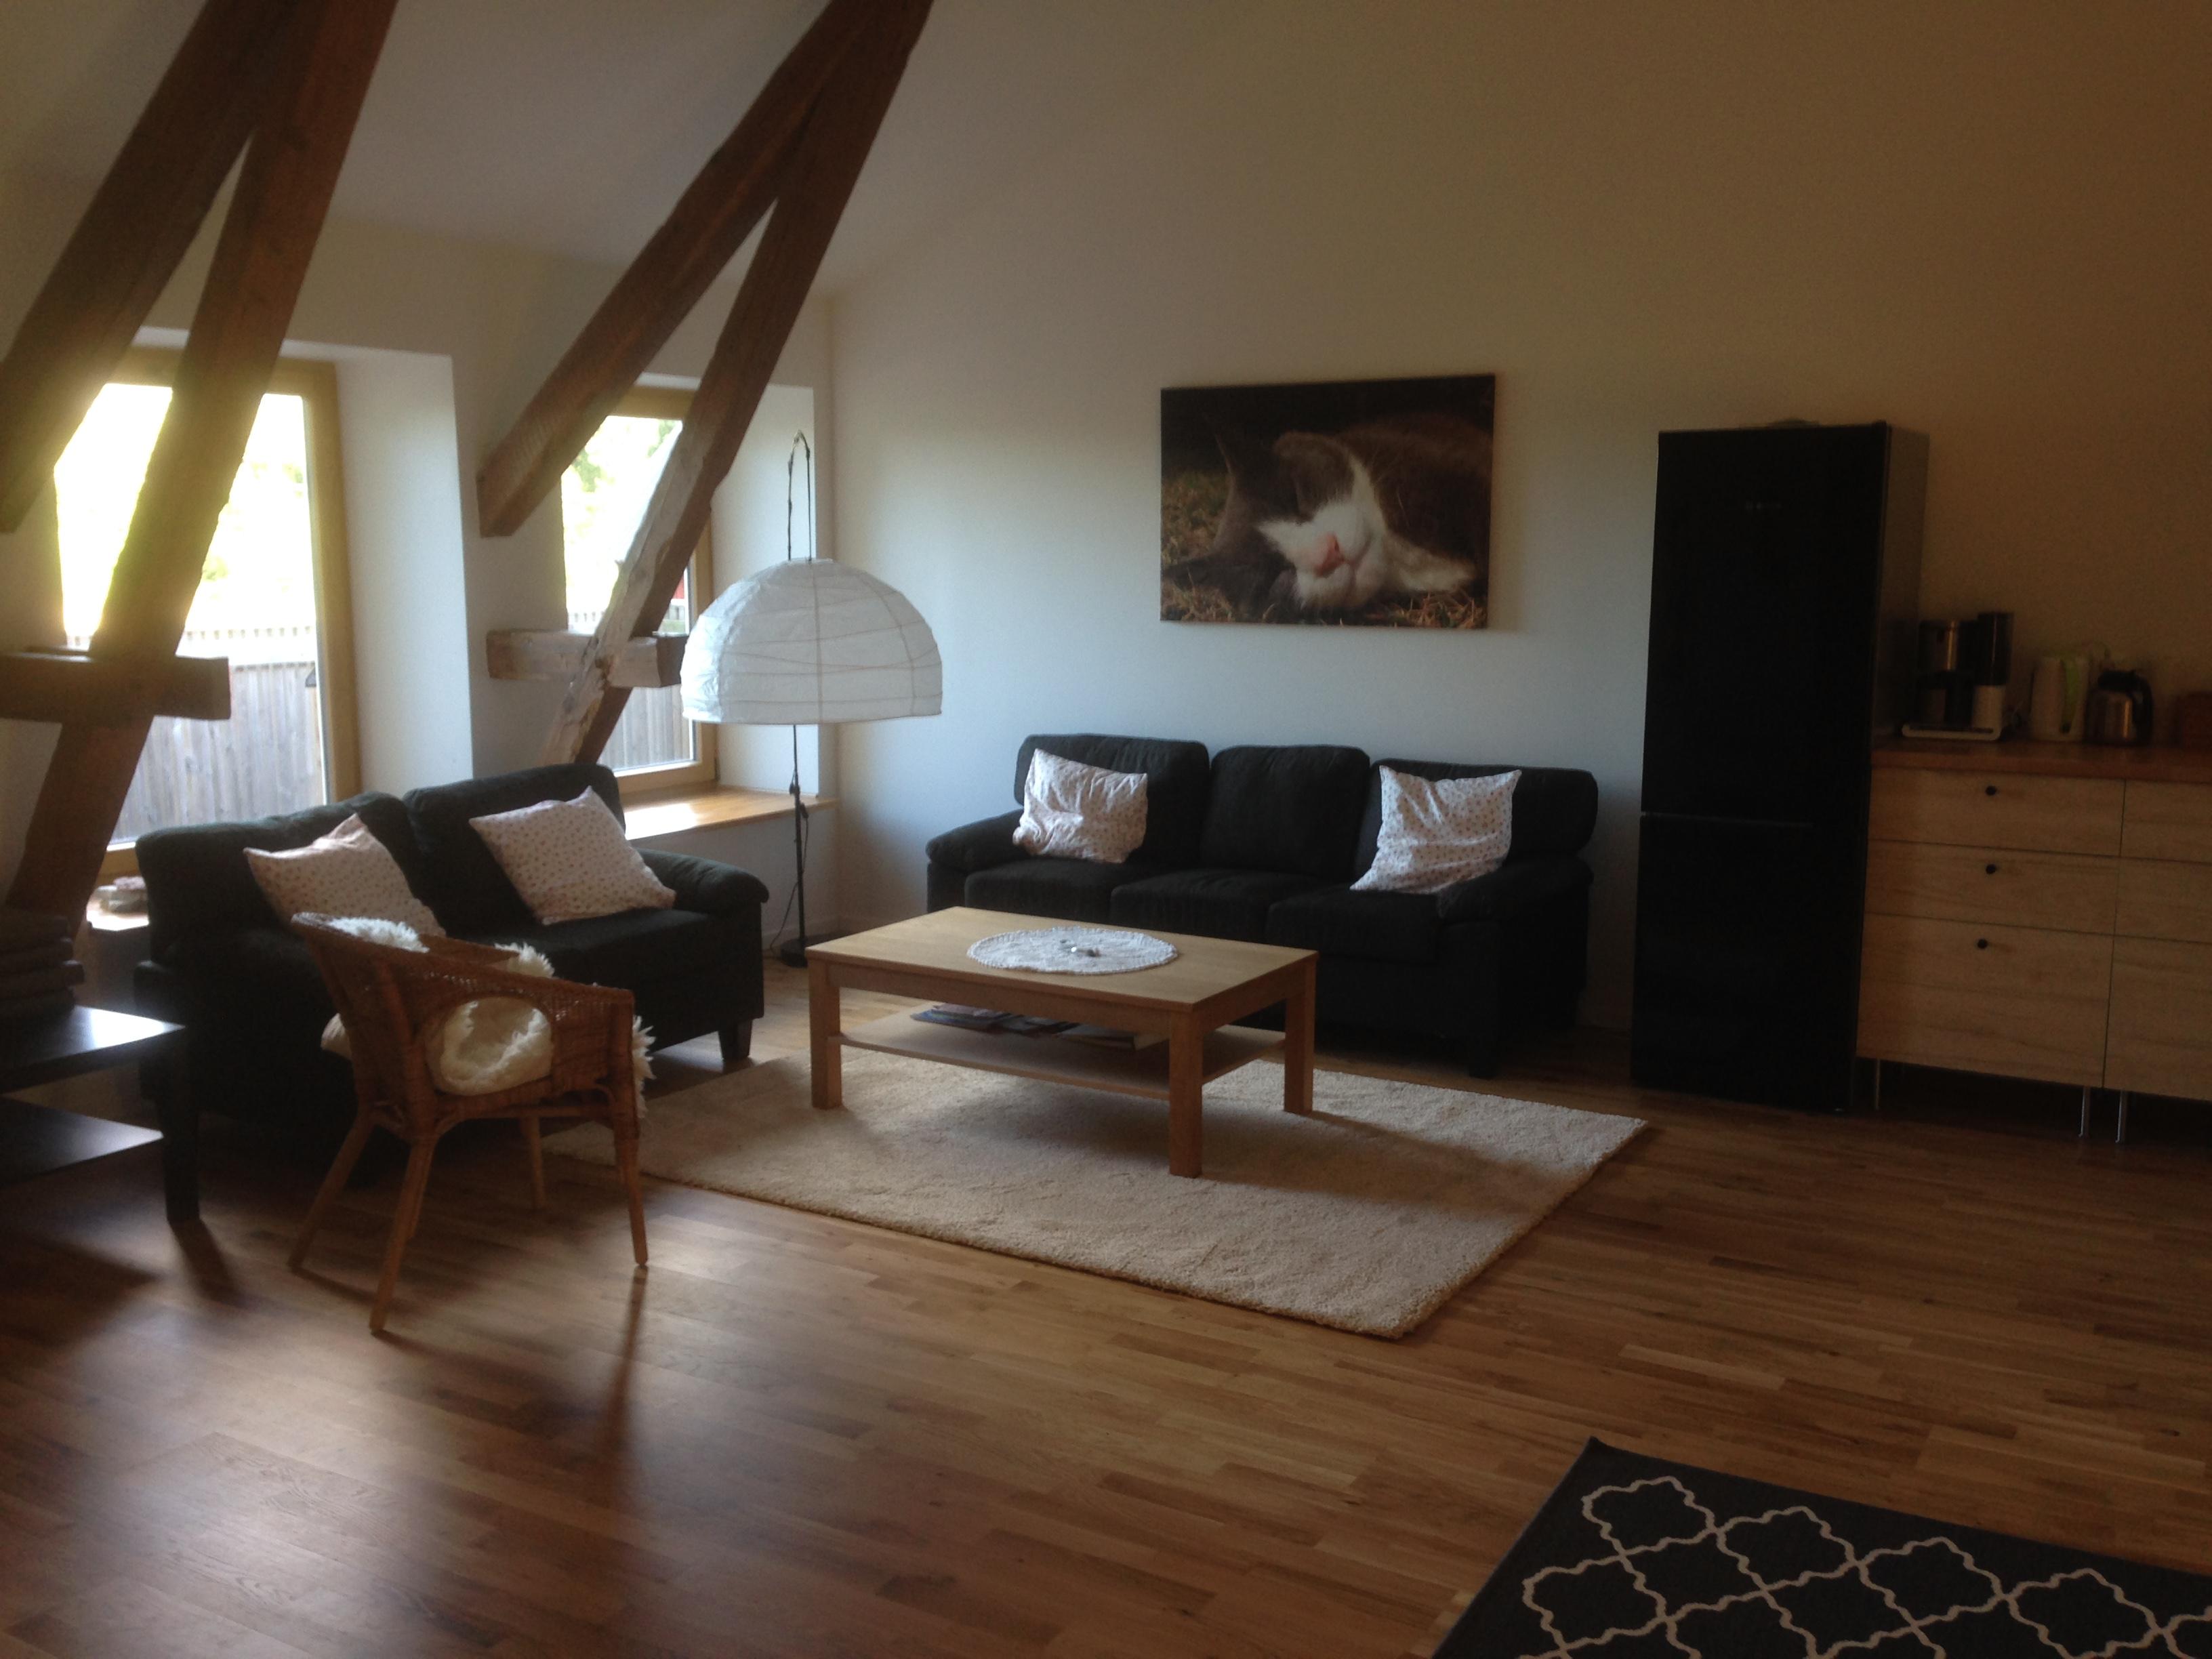 Gemütliches Wohnzimmer gemütliches wohnzimmer solberga gard